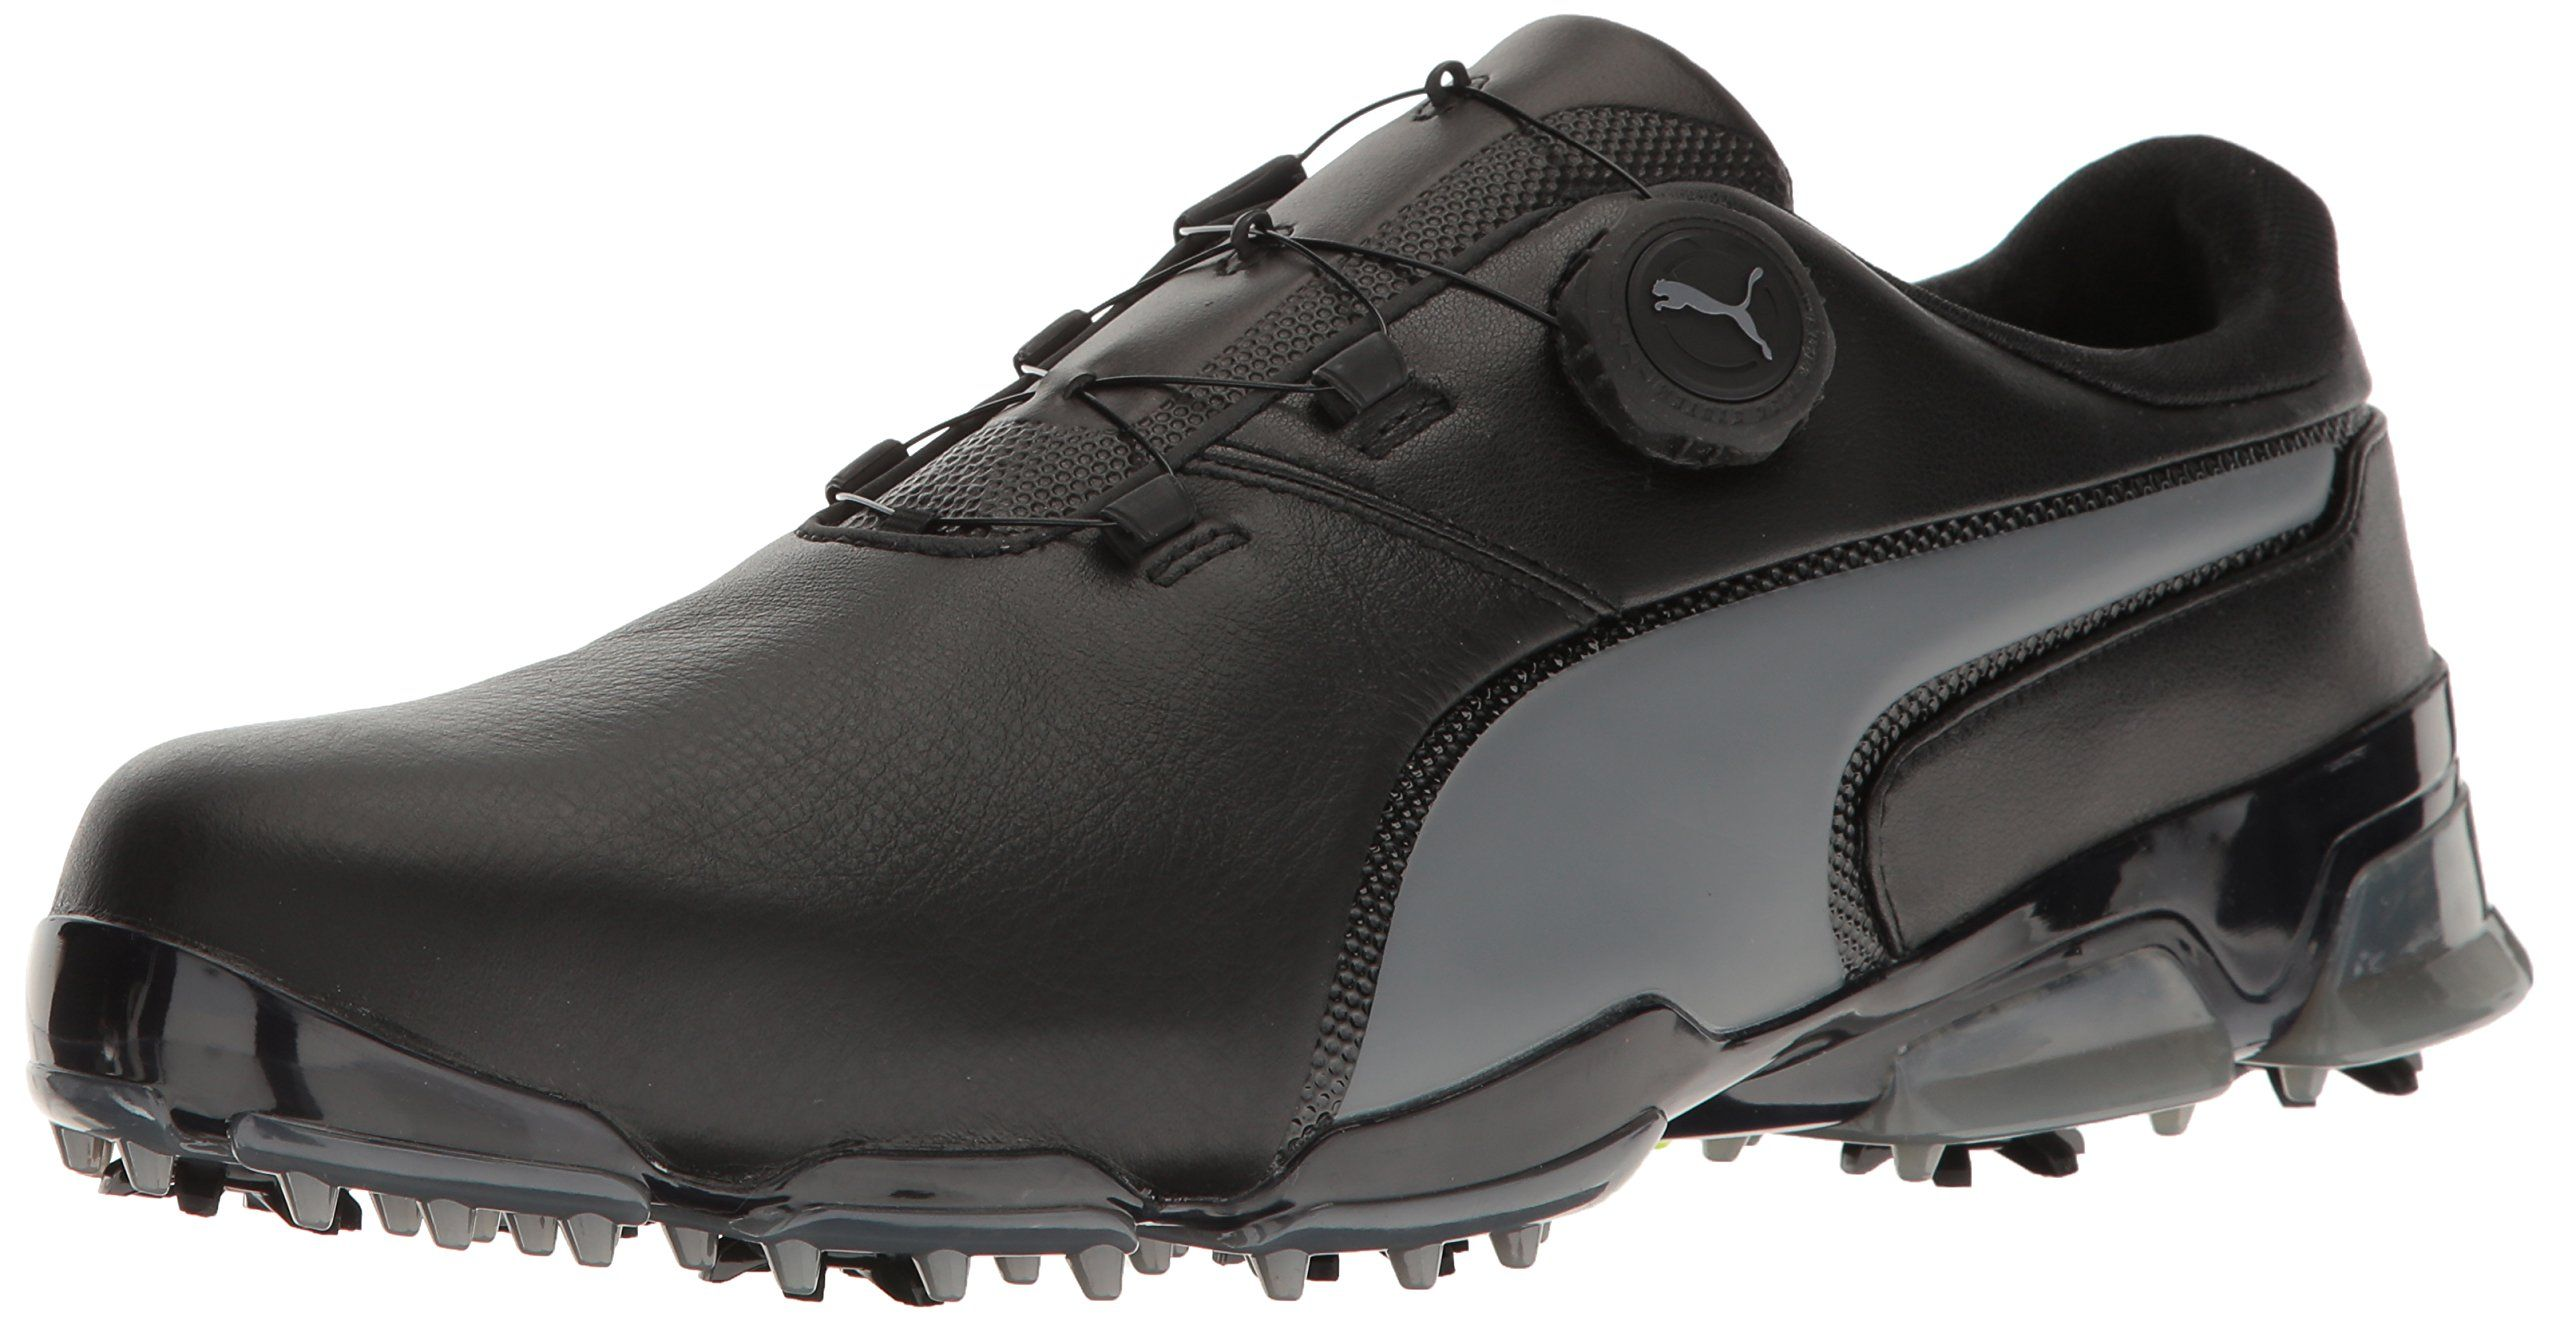 60c18c2d09d Puma Golf Men s Titantour Ignite Disc Golf-Shoes